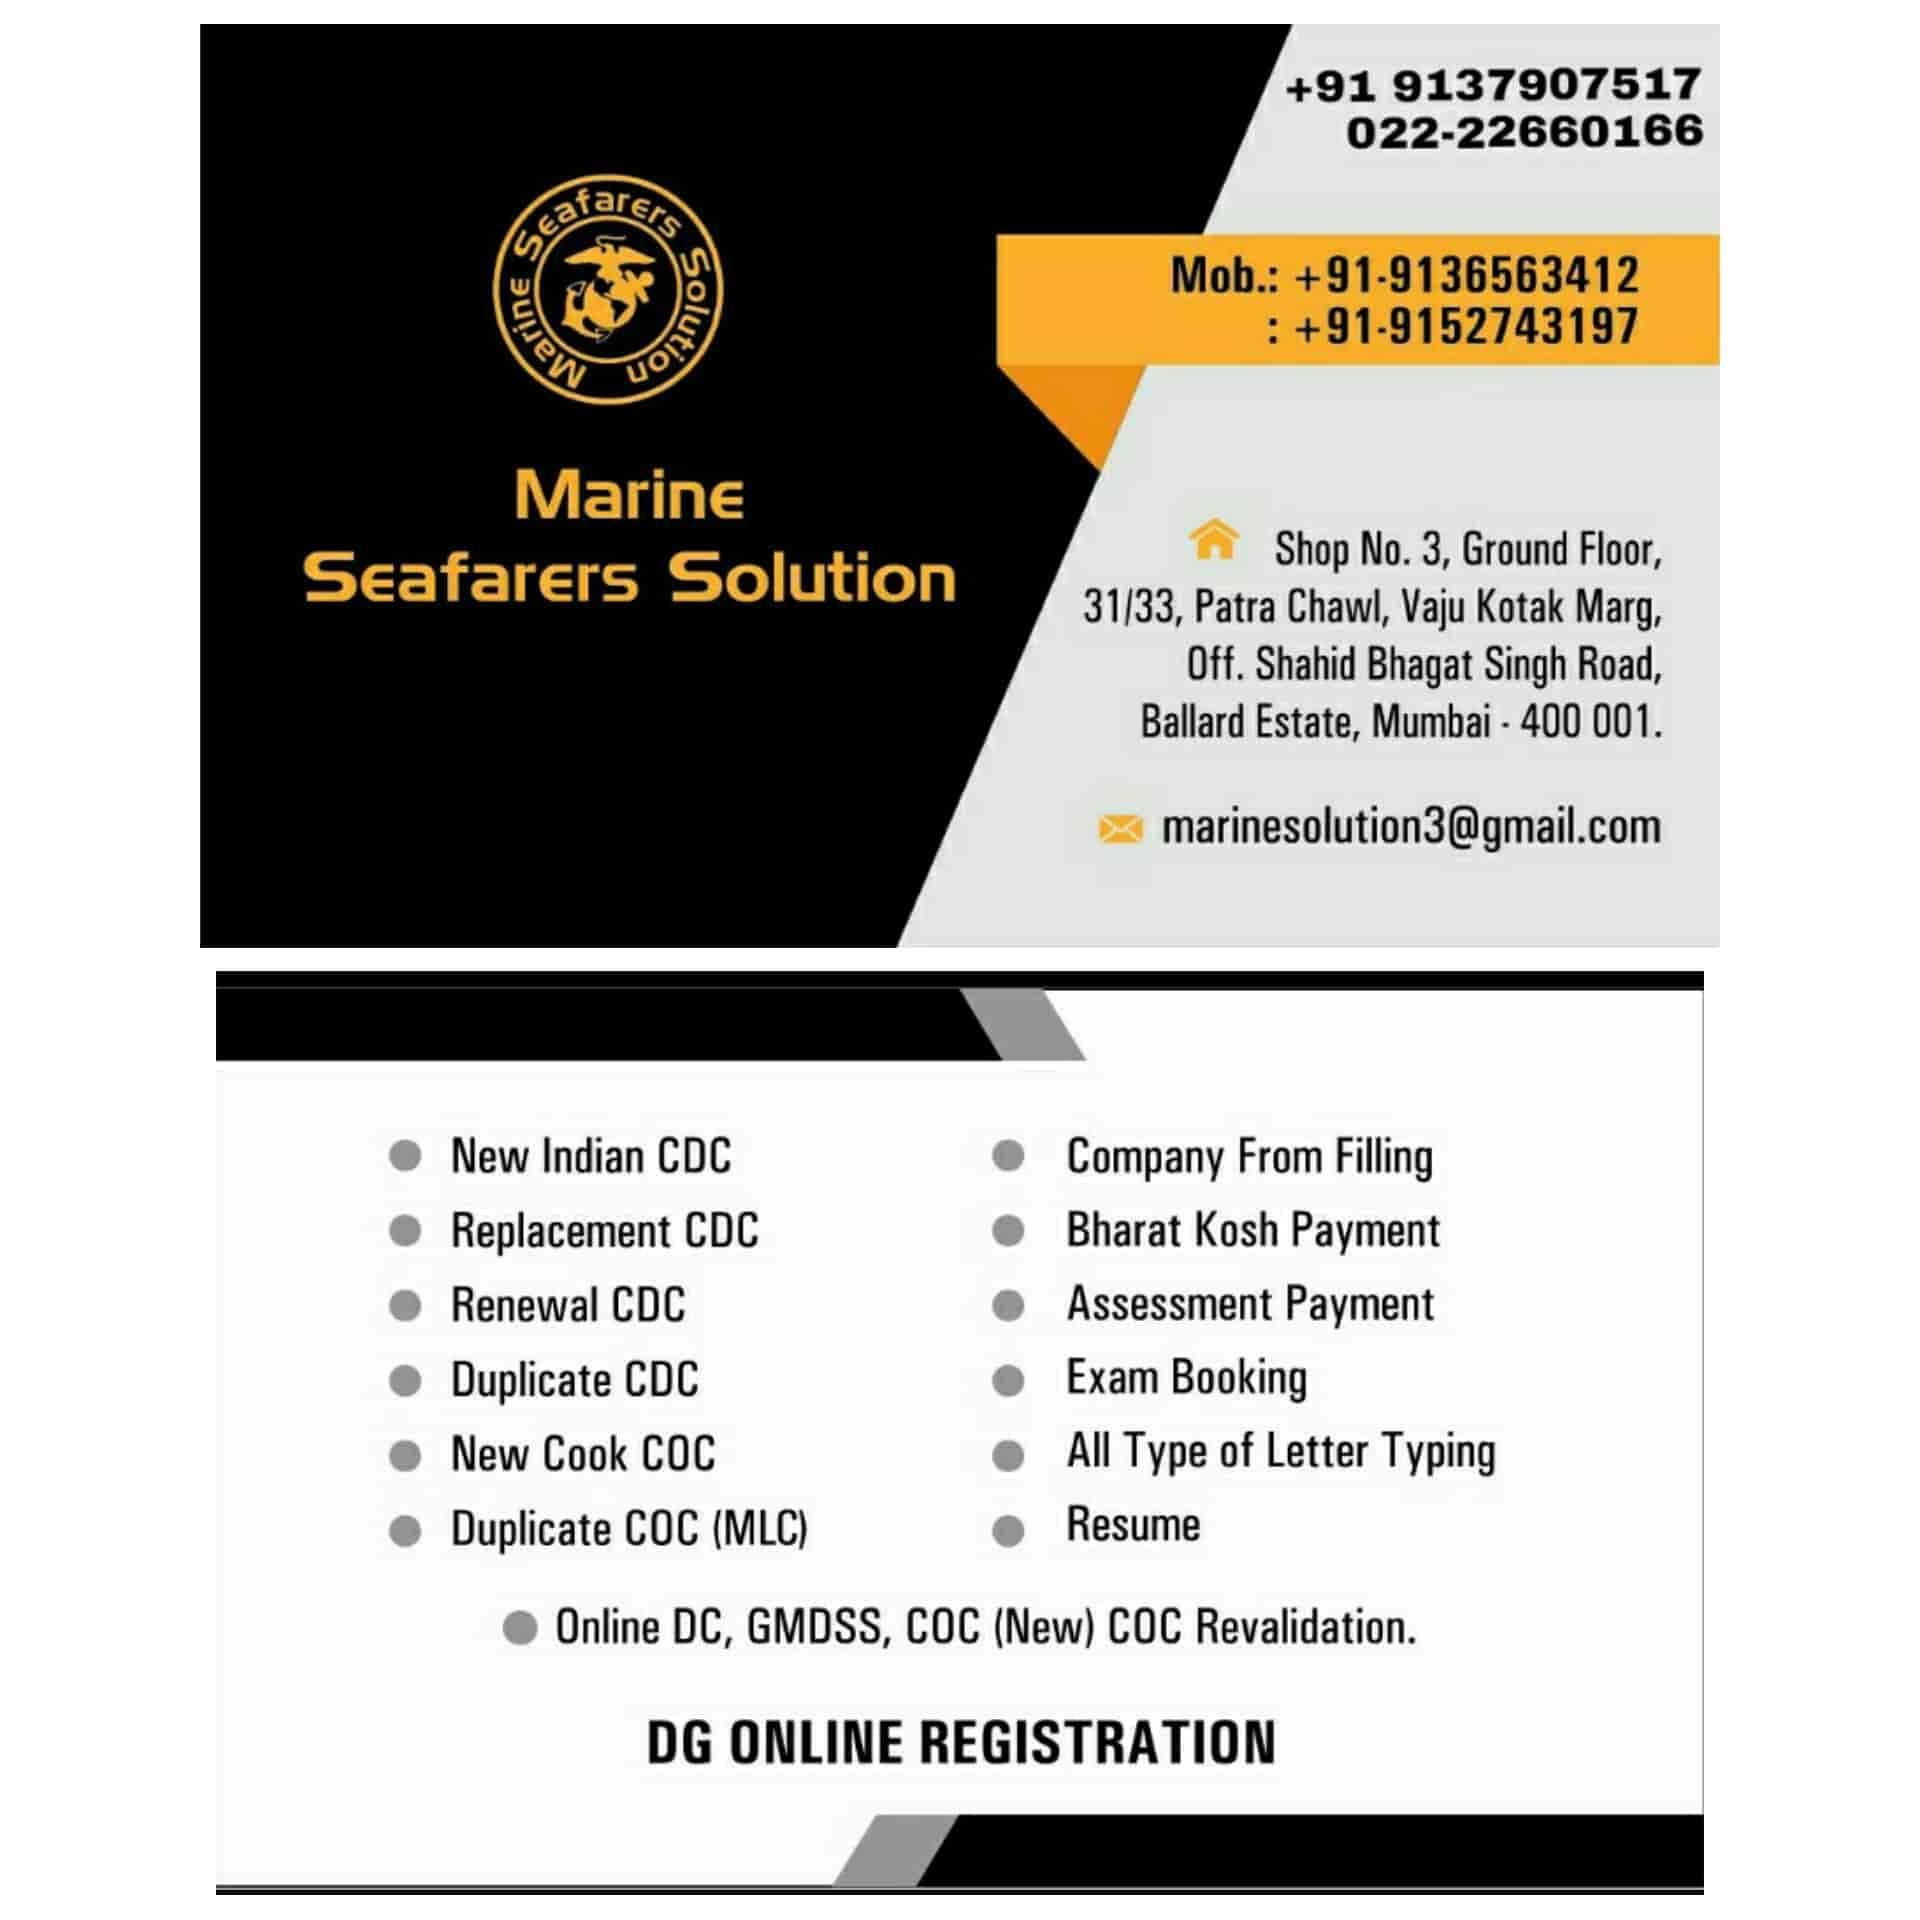 Dg shipping coc verification